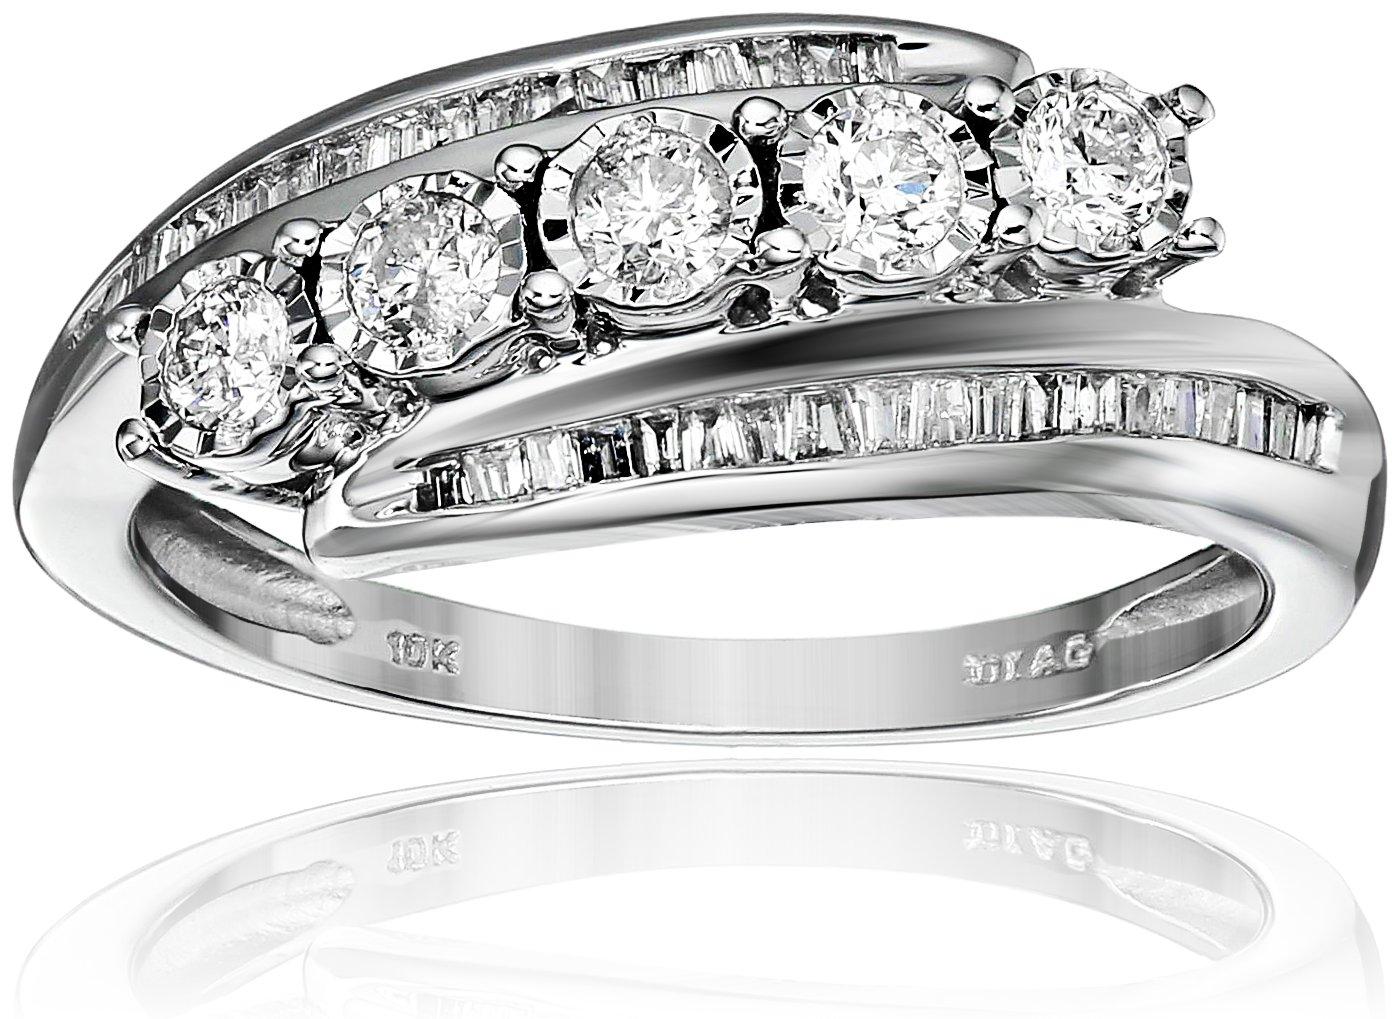 10k White Gold Diamond Slant Anniversary Ring (1/2cttw, I-J Color, I2-I3 Clarity), Size 7